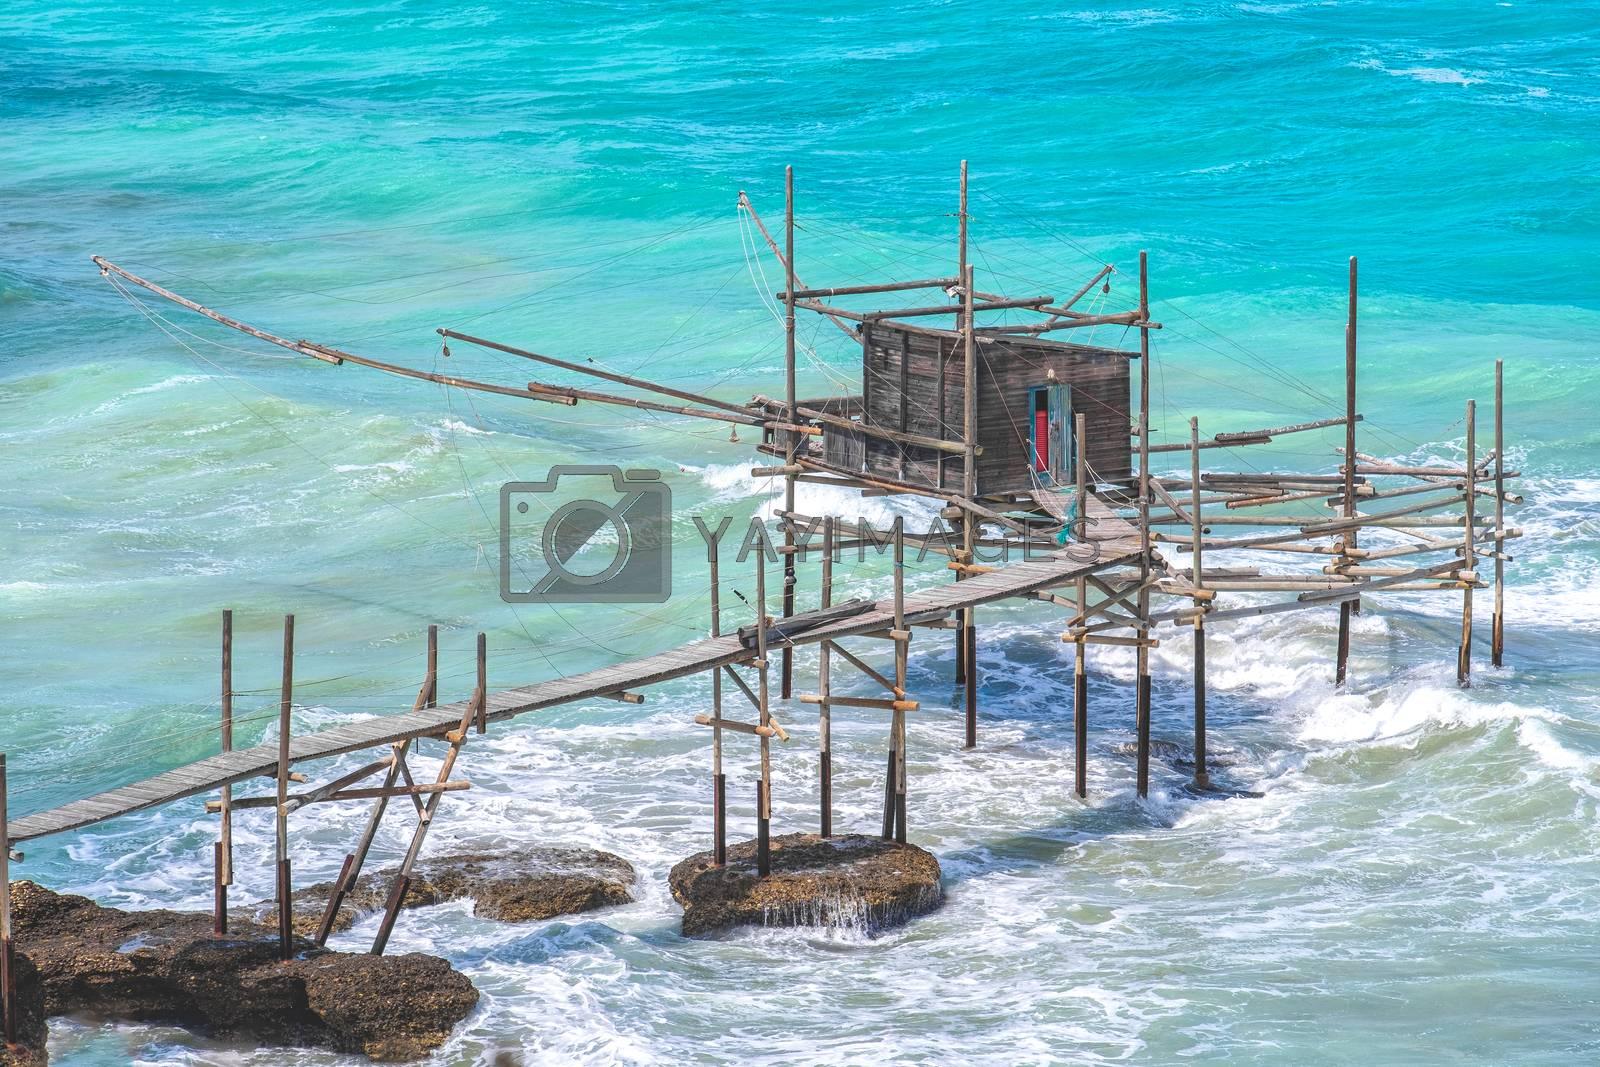 Trabocchi coast of Punta Aderci in Vasto - Abruzzo region Chieti trabucco or trabocco old wooden palatiffe stilt house shack fishing machine from south italy sea